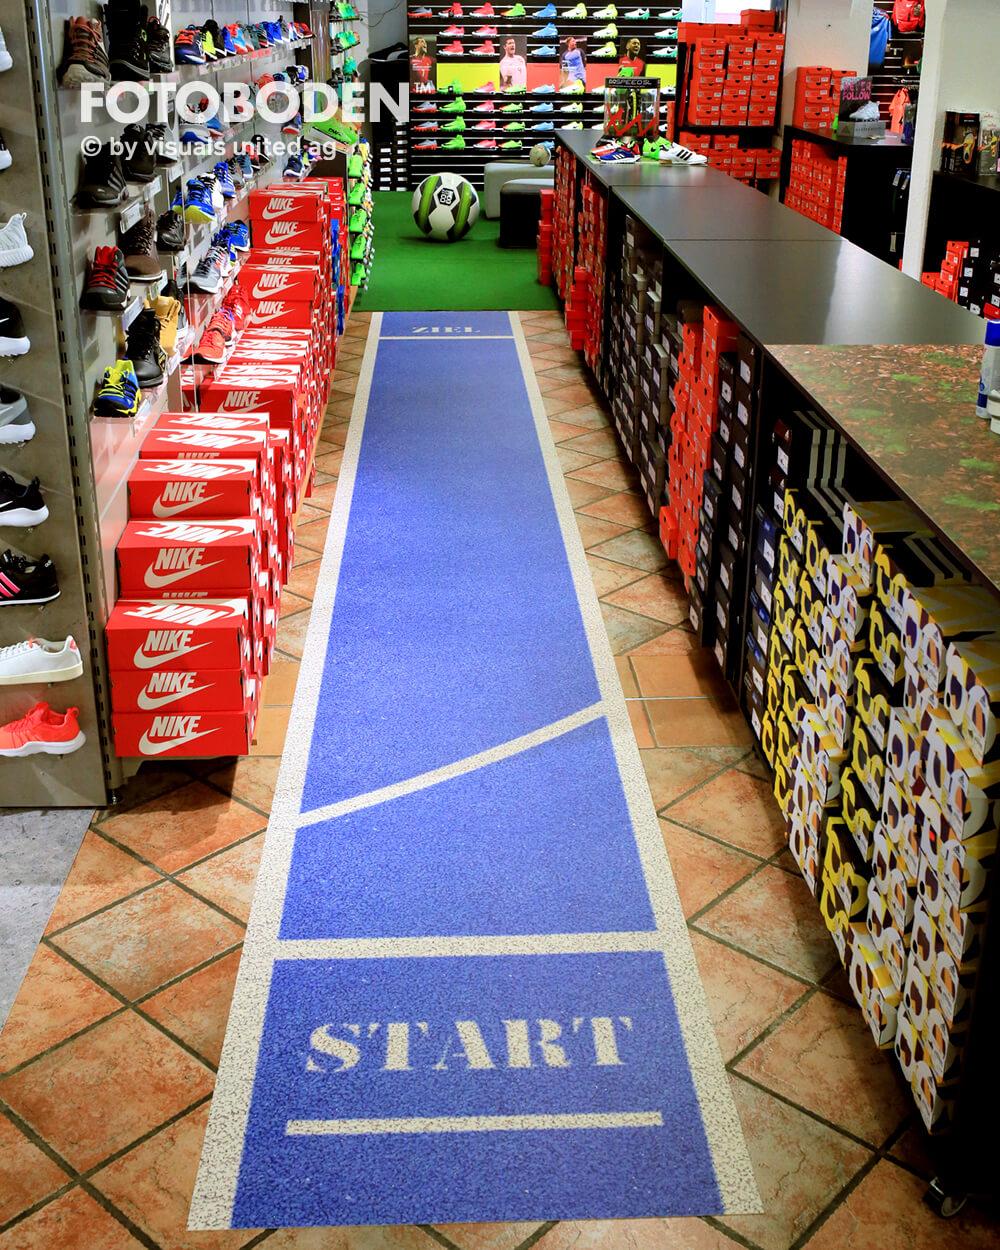 Sport9Fotoboden Flooring Fußboden Bodengestaltung Floorminder Bodendruck Werbung Fußbodenwerbung Bodenwerbung Merchandising Advertising